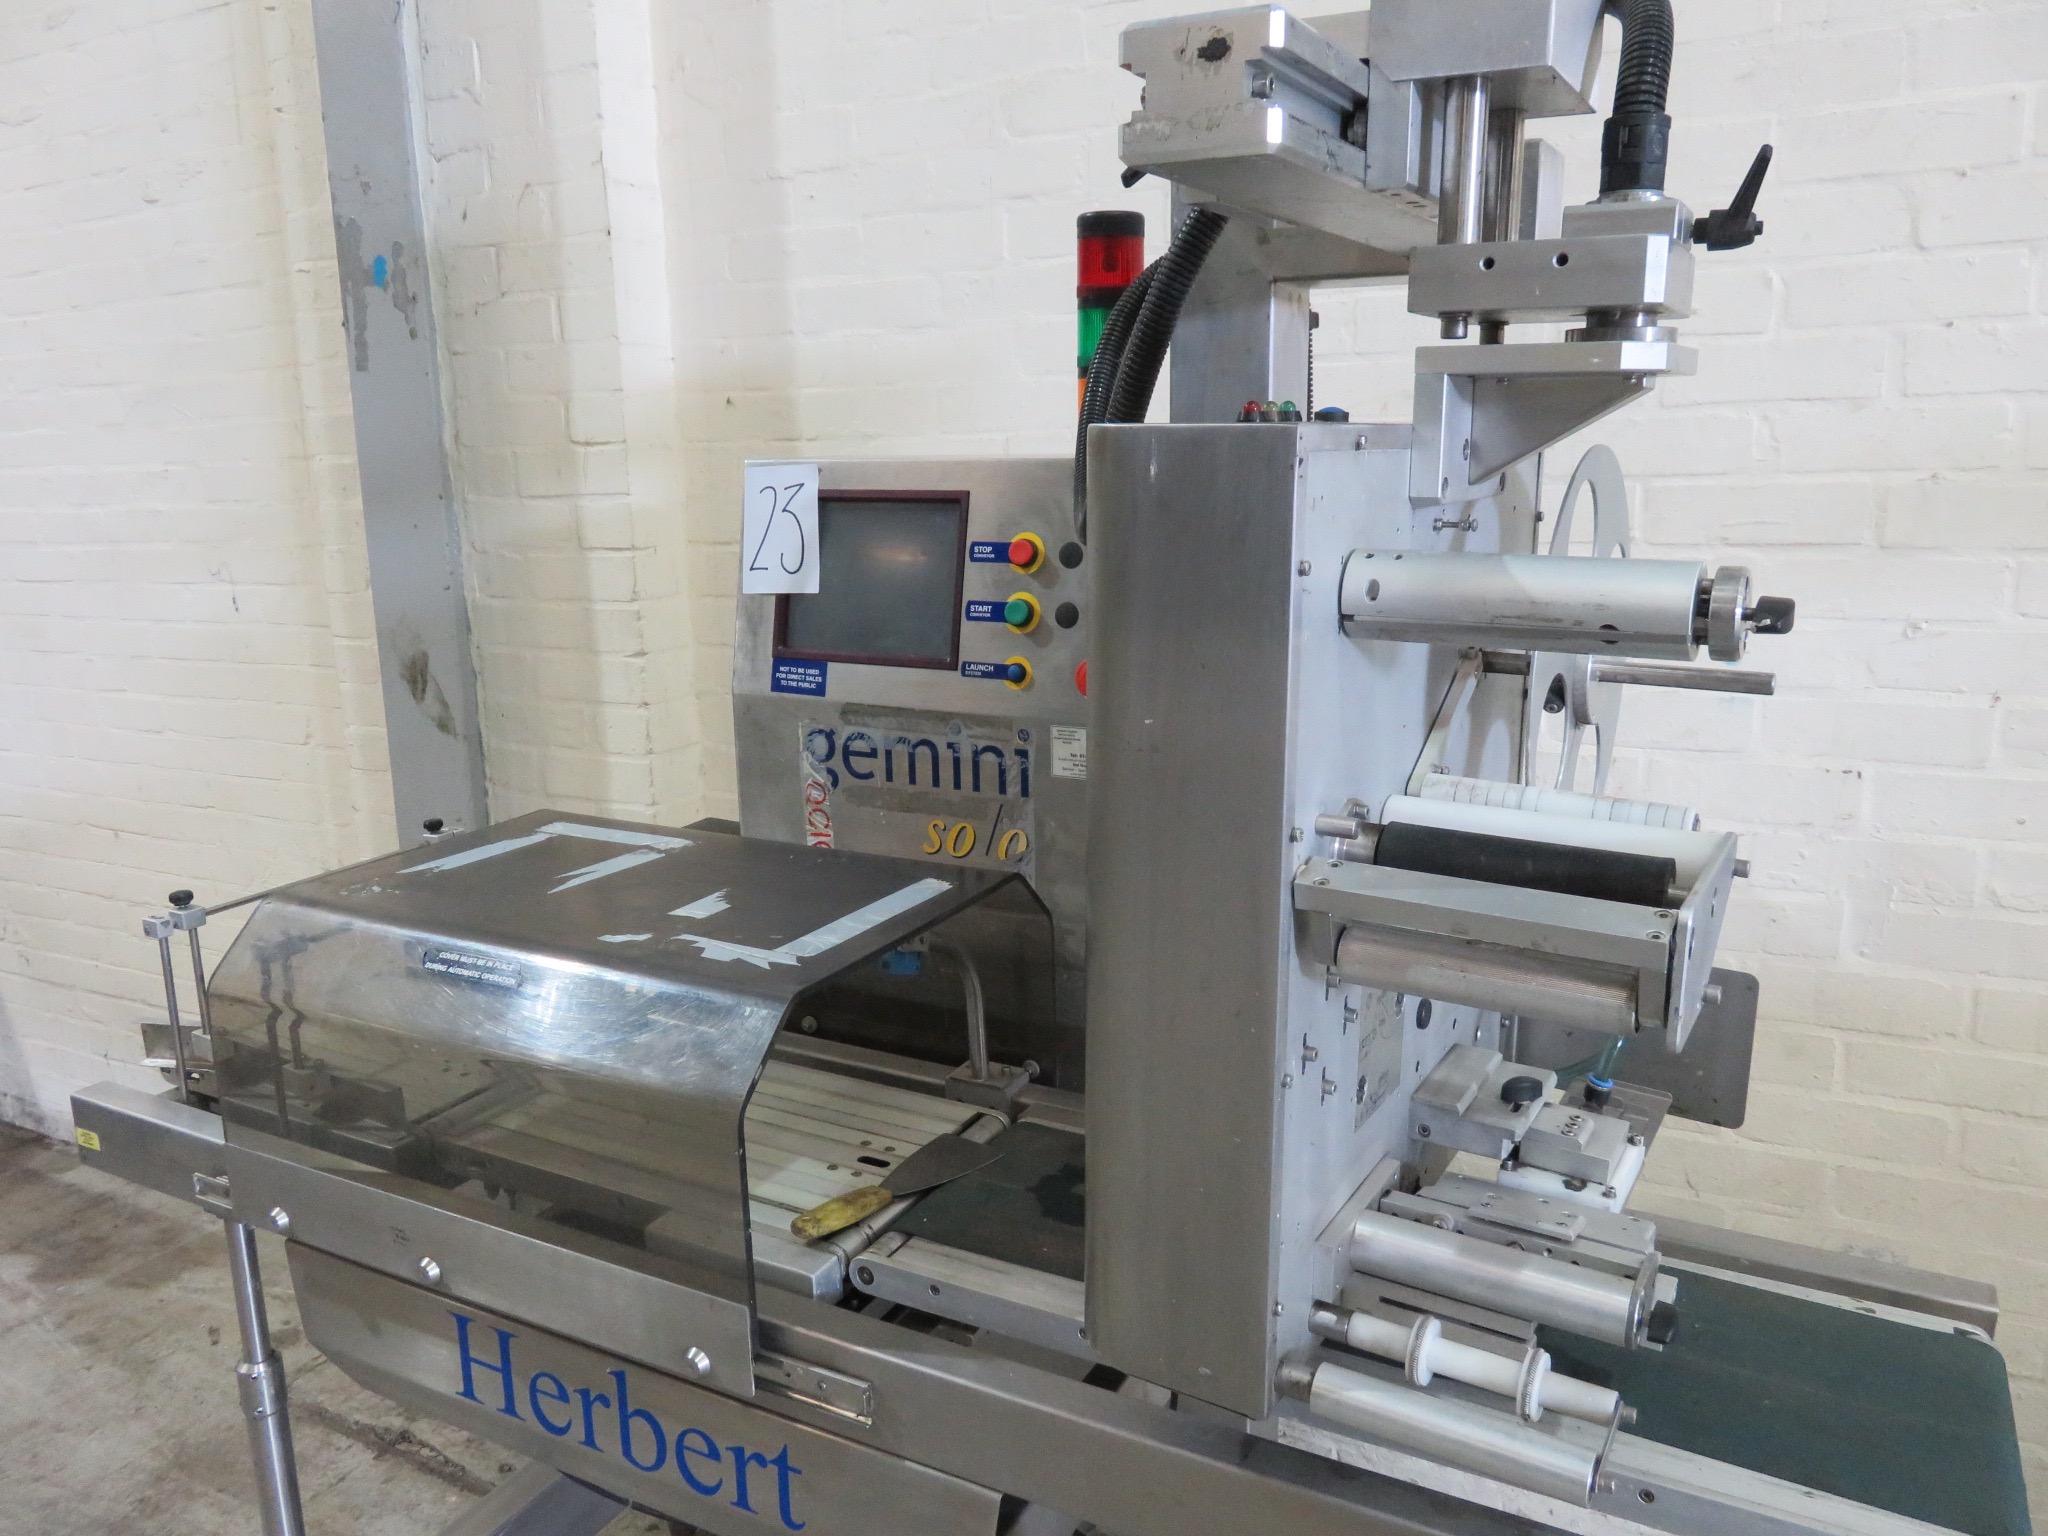 Lot 23 - Herbert Gemini Solo - Weigh, price & labelling machine. Model Gemini. Weigh platform 450mm long x 2